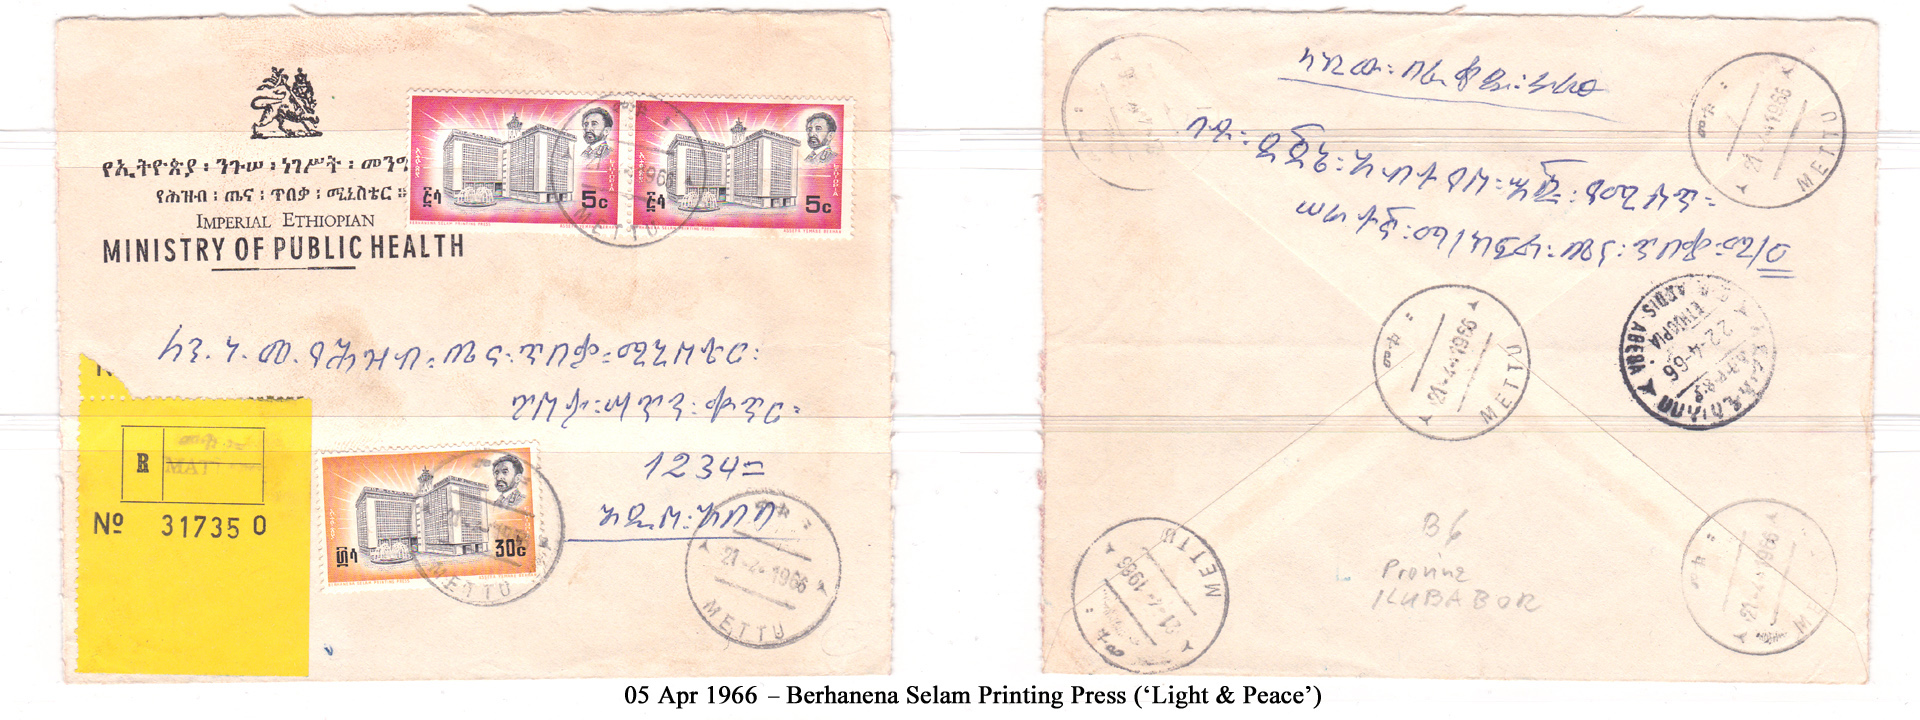 19660405 – Berhanena Selam Printing Press ('Light & Peace')